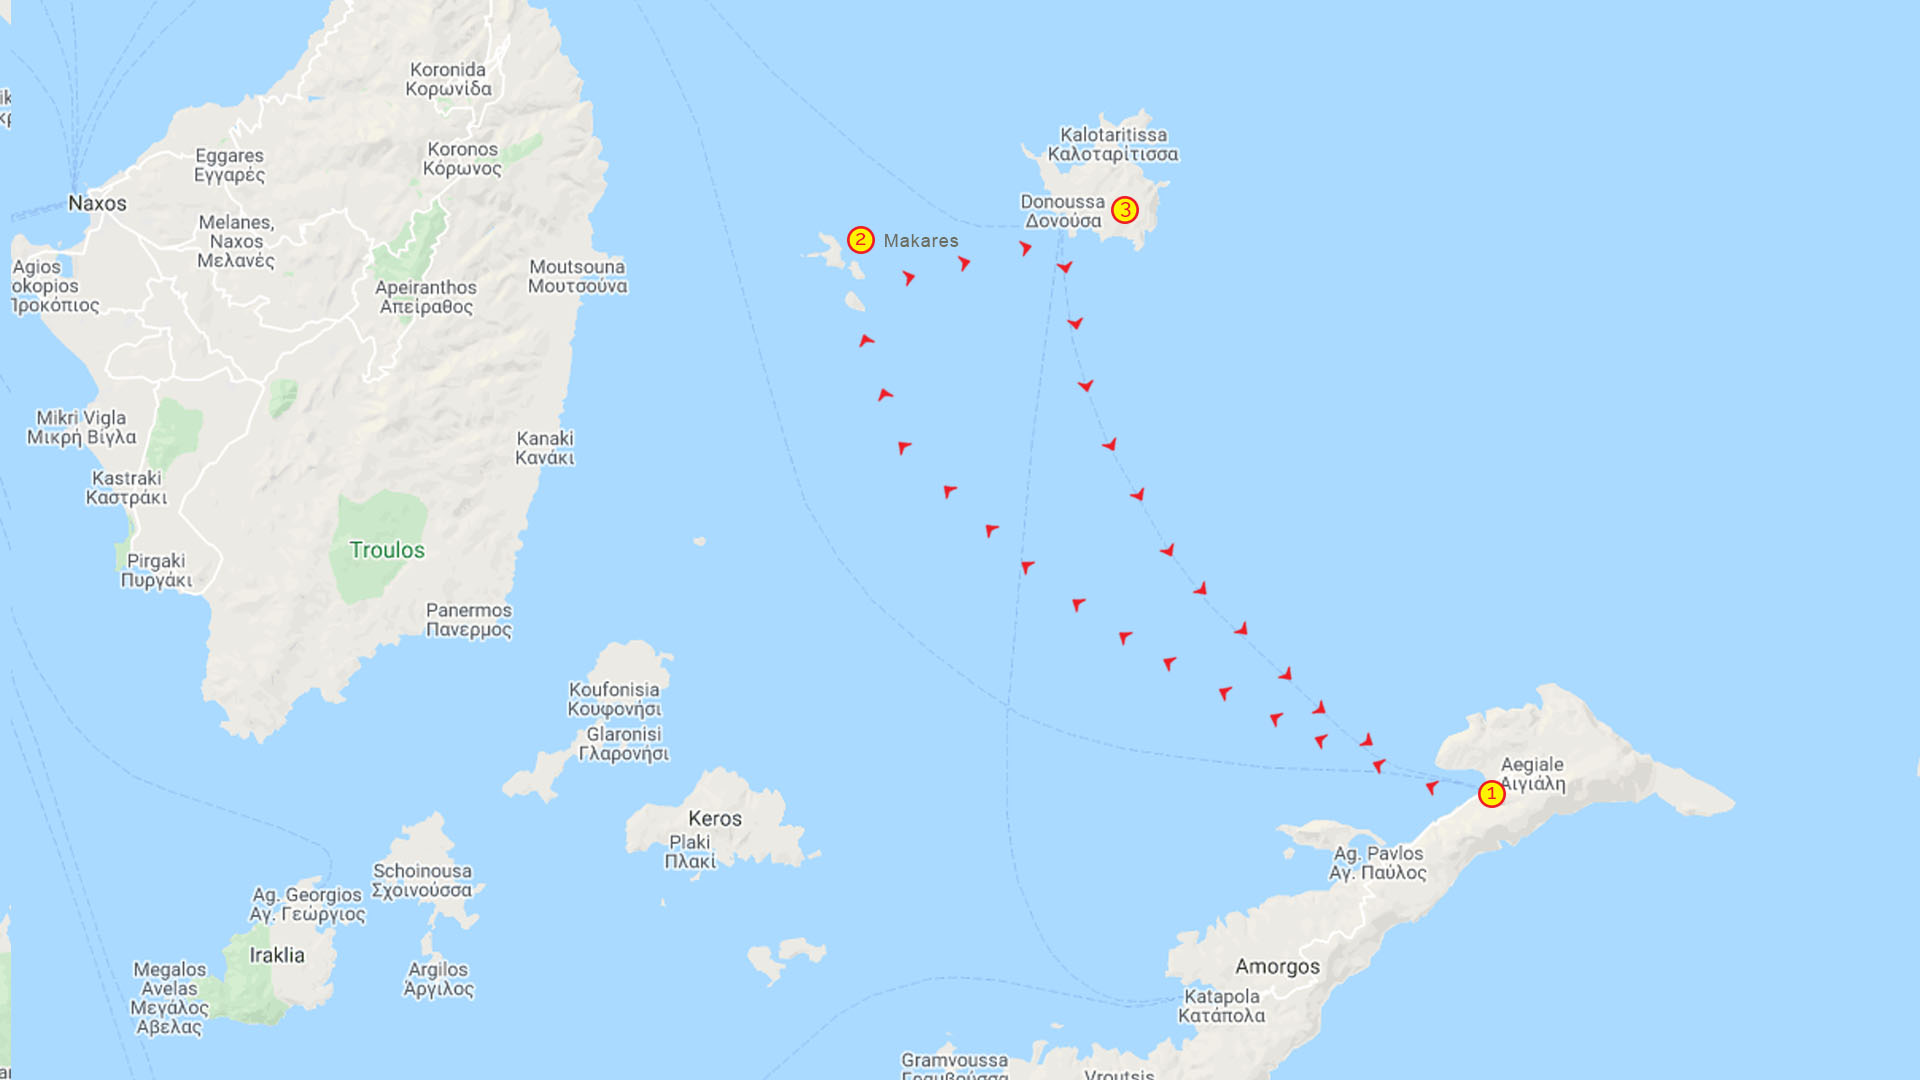 Day Cruise Makares & Dounosa Map